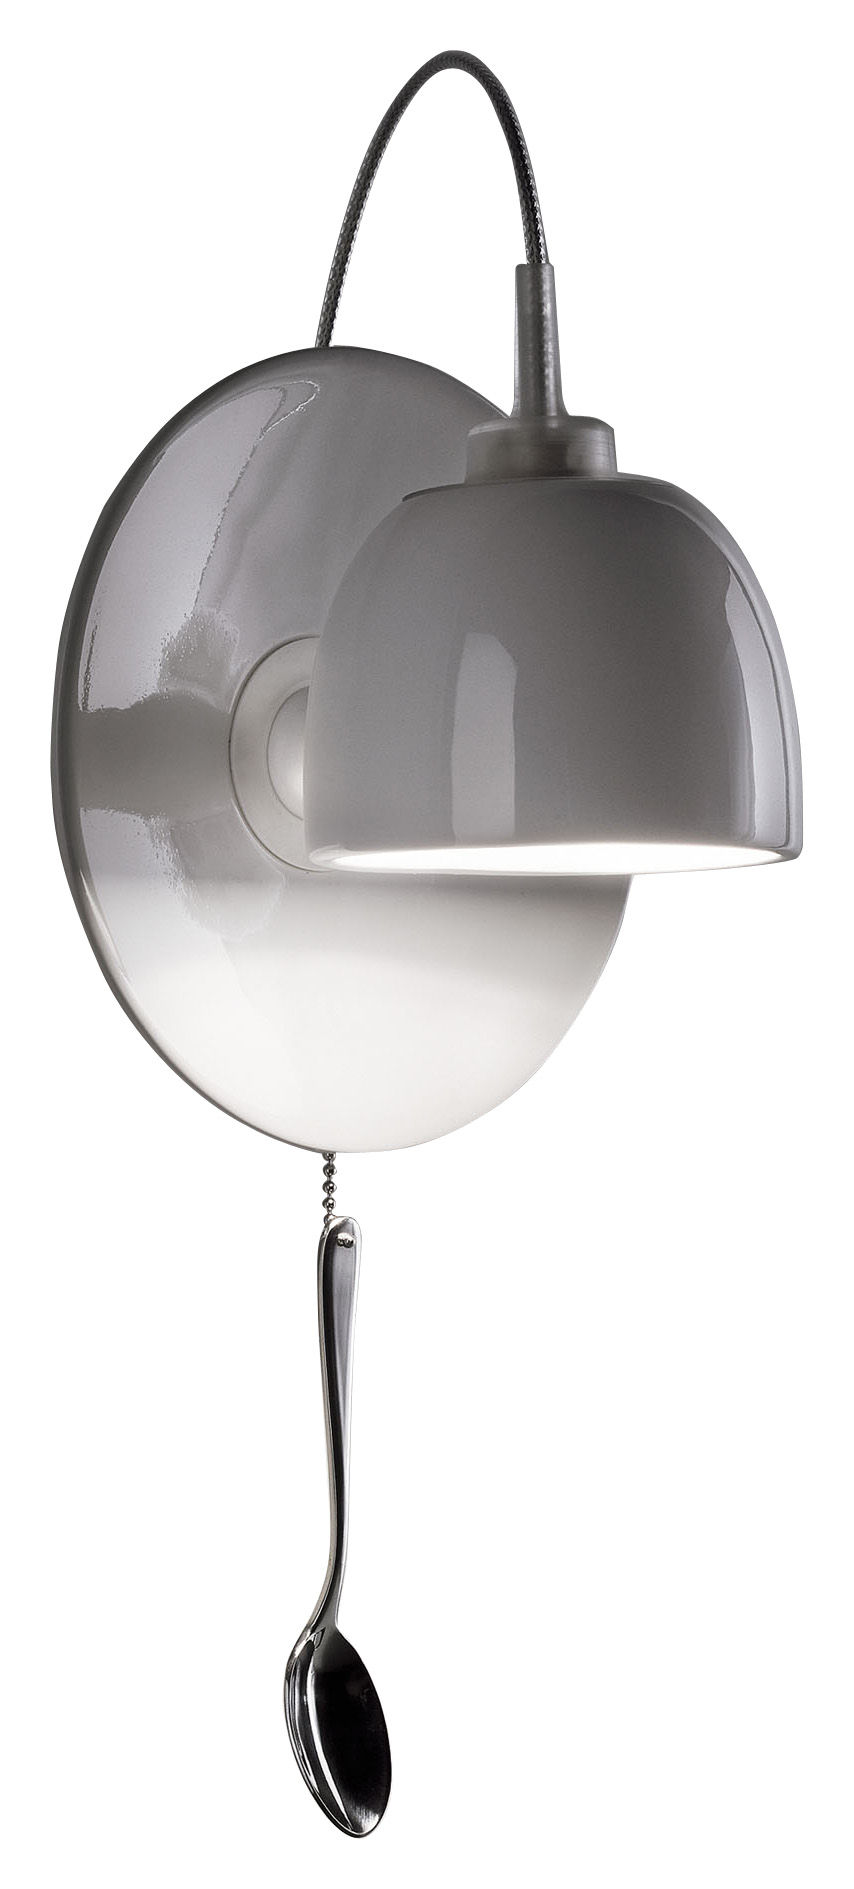 Illuminazione - Lampade da parete - Applique Light au Lait - Lampada di Ingo Maurer - Bianco porcellana - Acciaio inossidabile, Porcellana